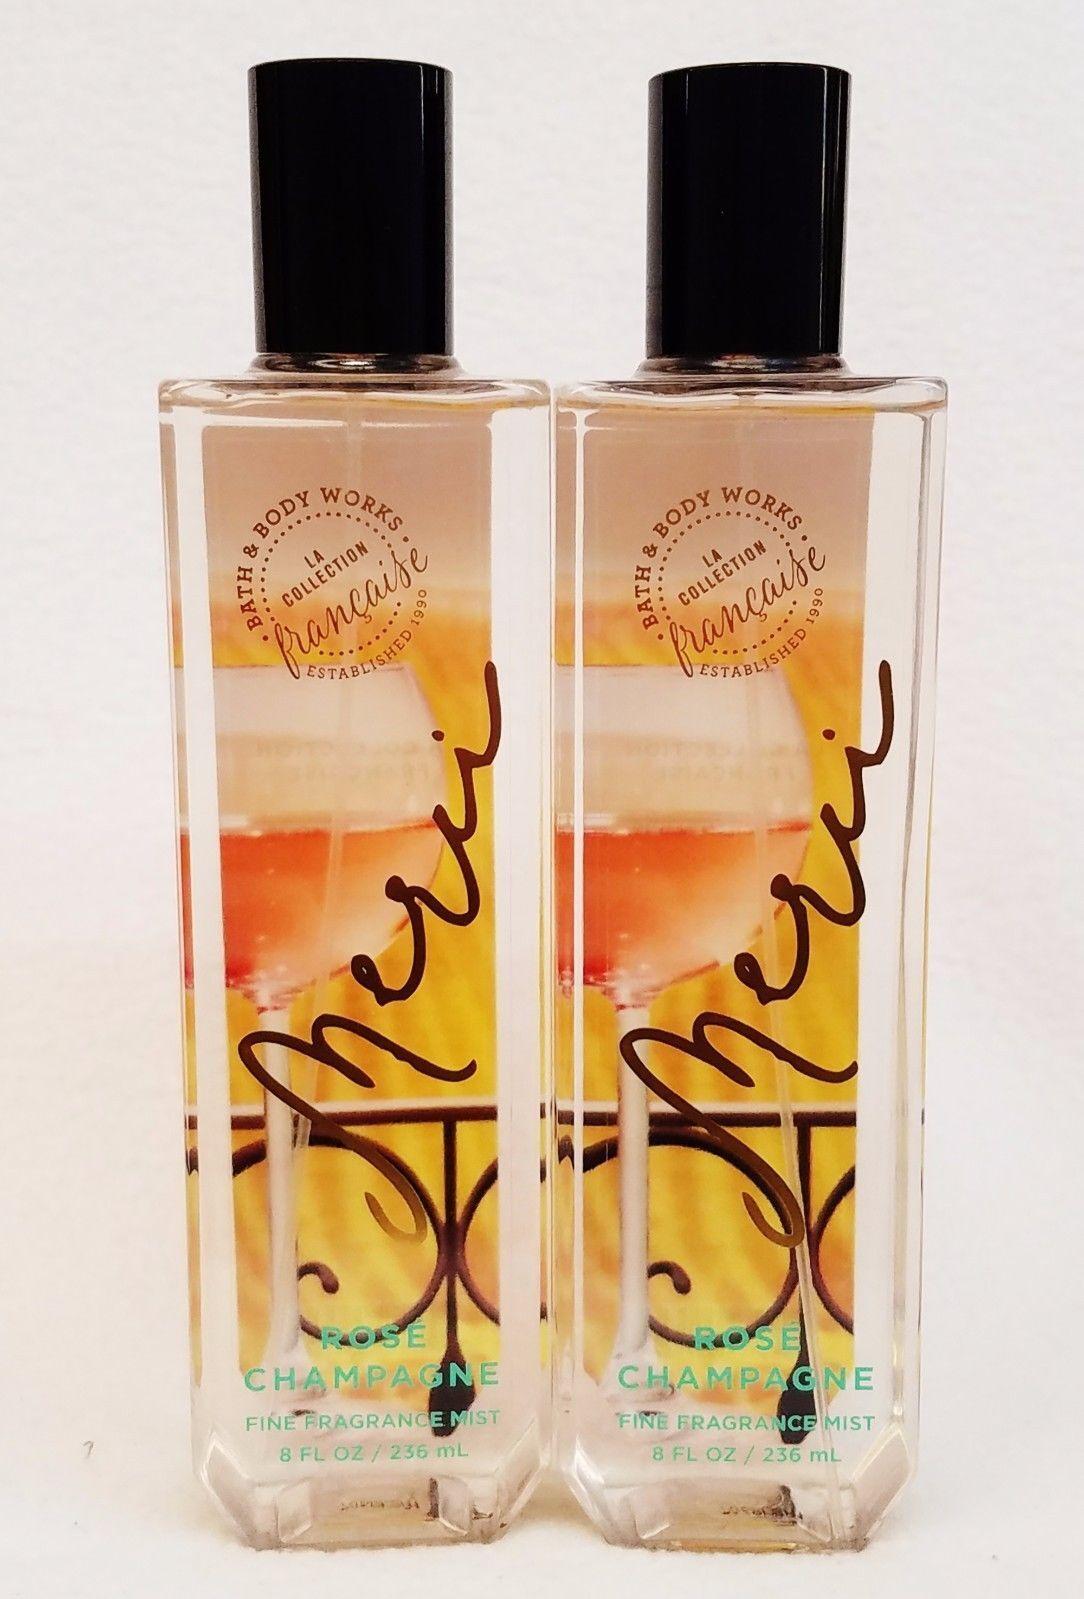 2 Bath & Body Works MERCI ROSE CHAMPAGNE Fine Fragrance Mist